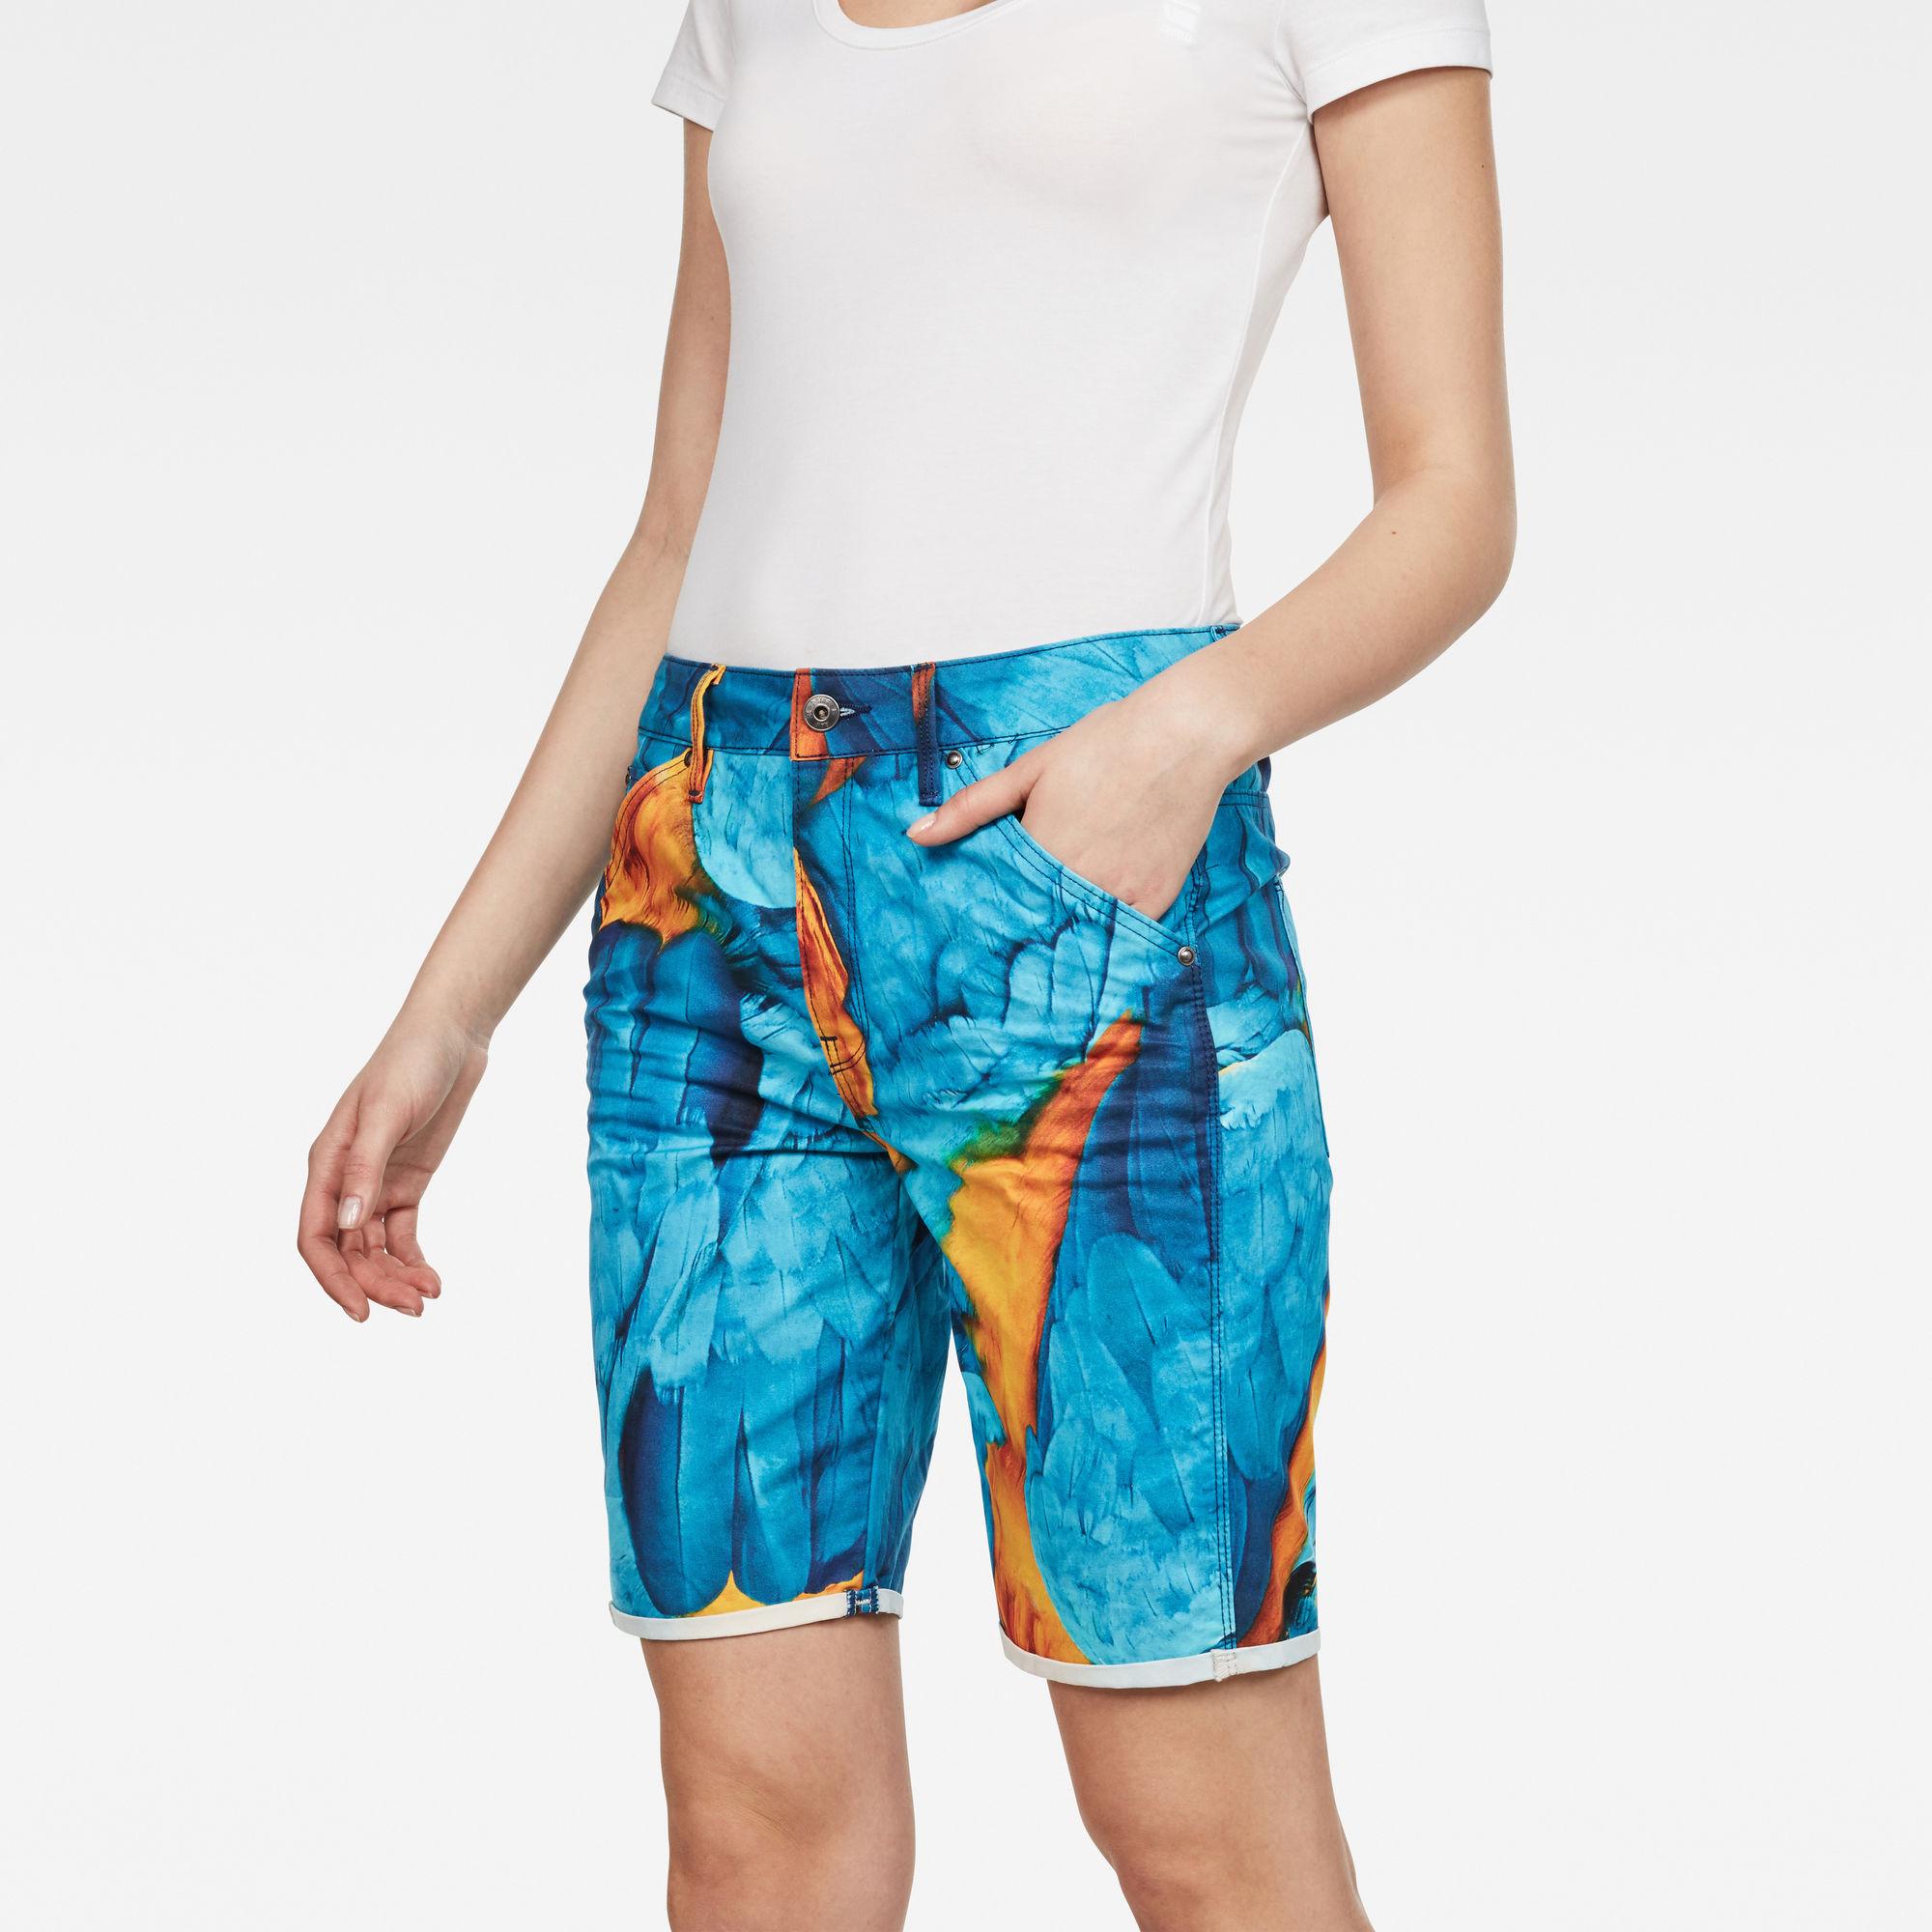 G-Star Elwood X25 3D Boyfriend Women's Shorts